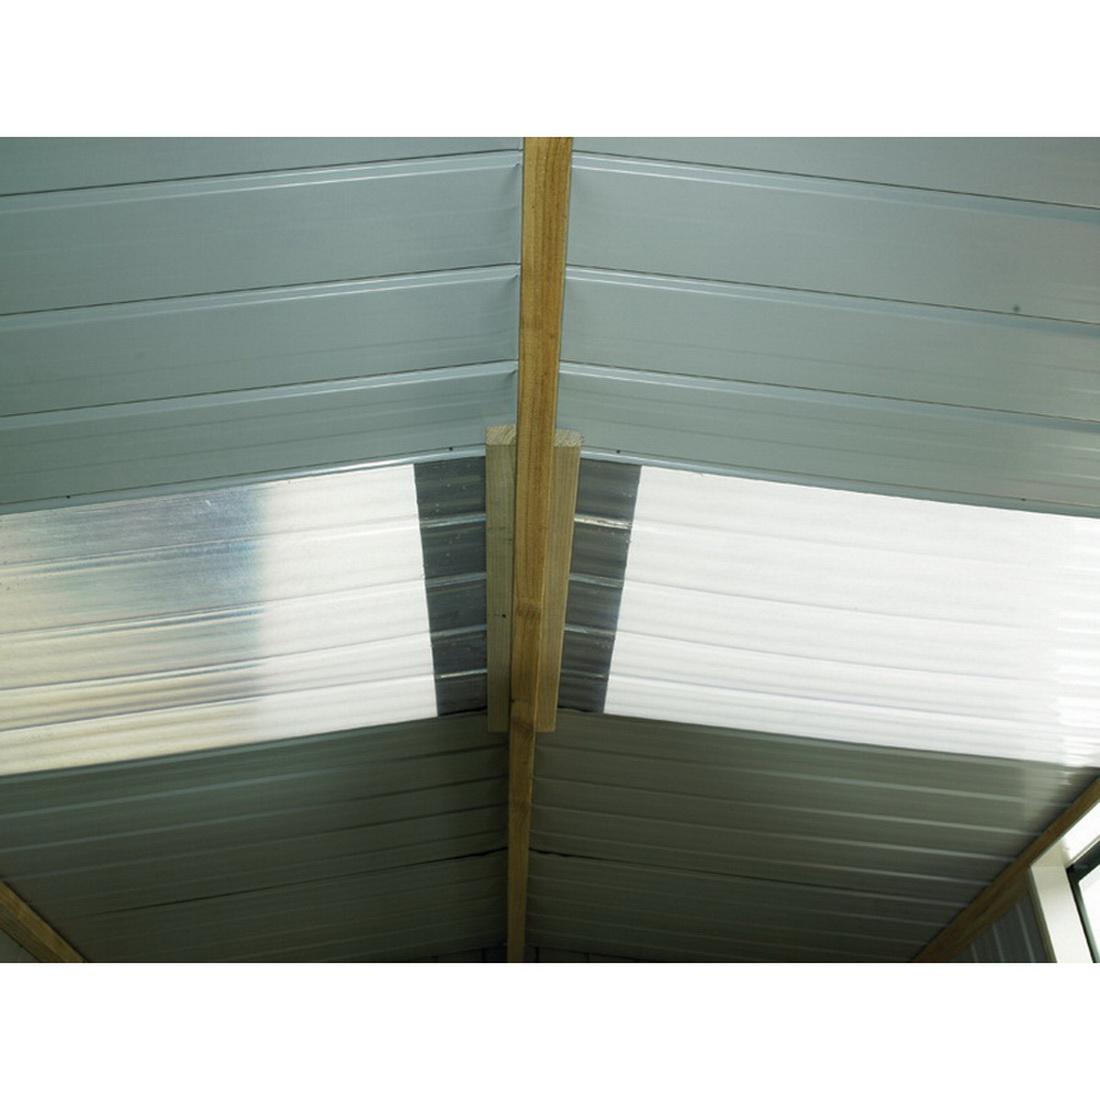 Kiwi Type A Single Side Clear Roof Panel